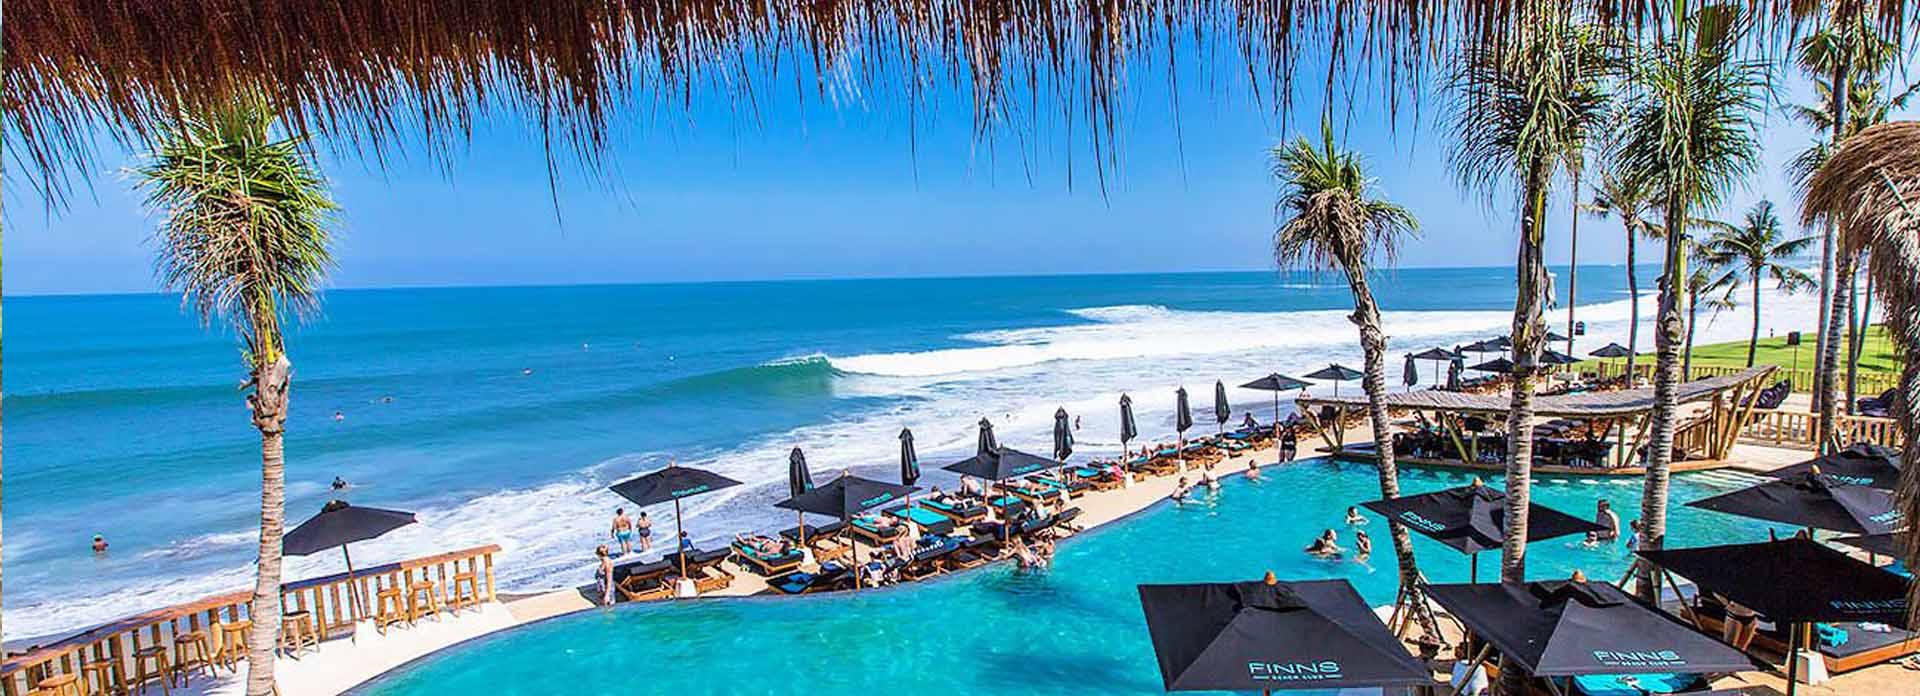 Parikrama Travels Bali Banner 3